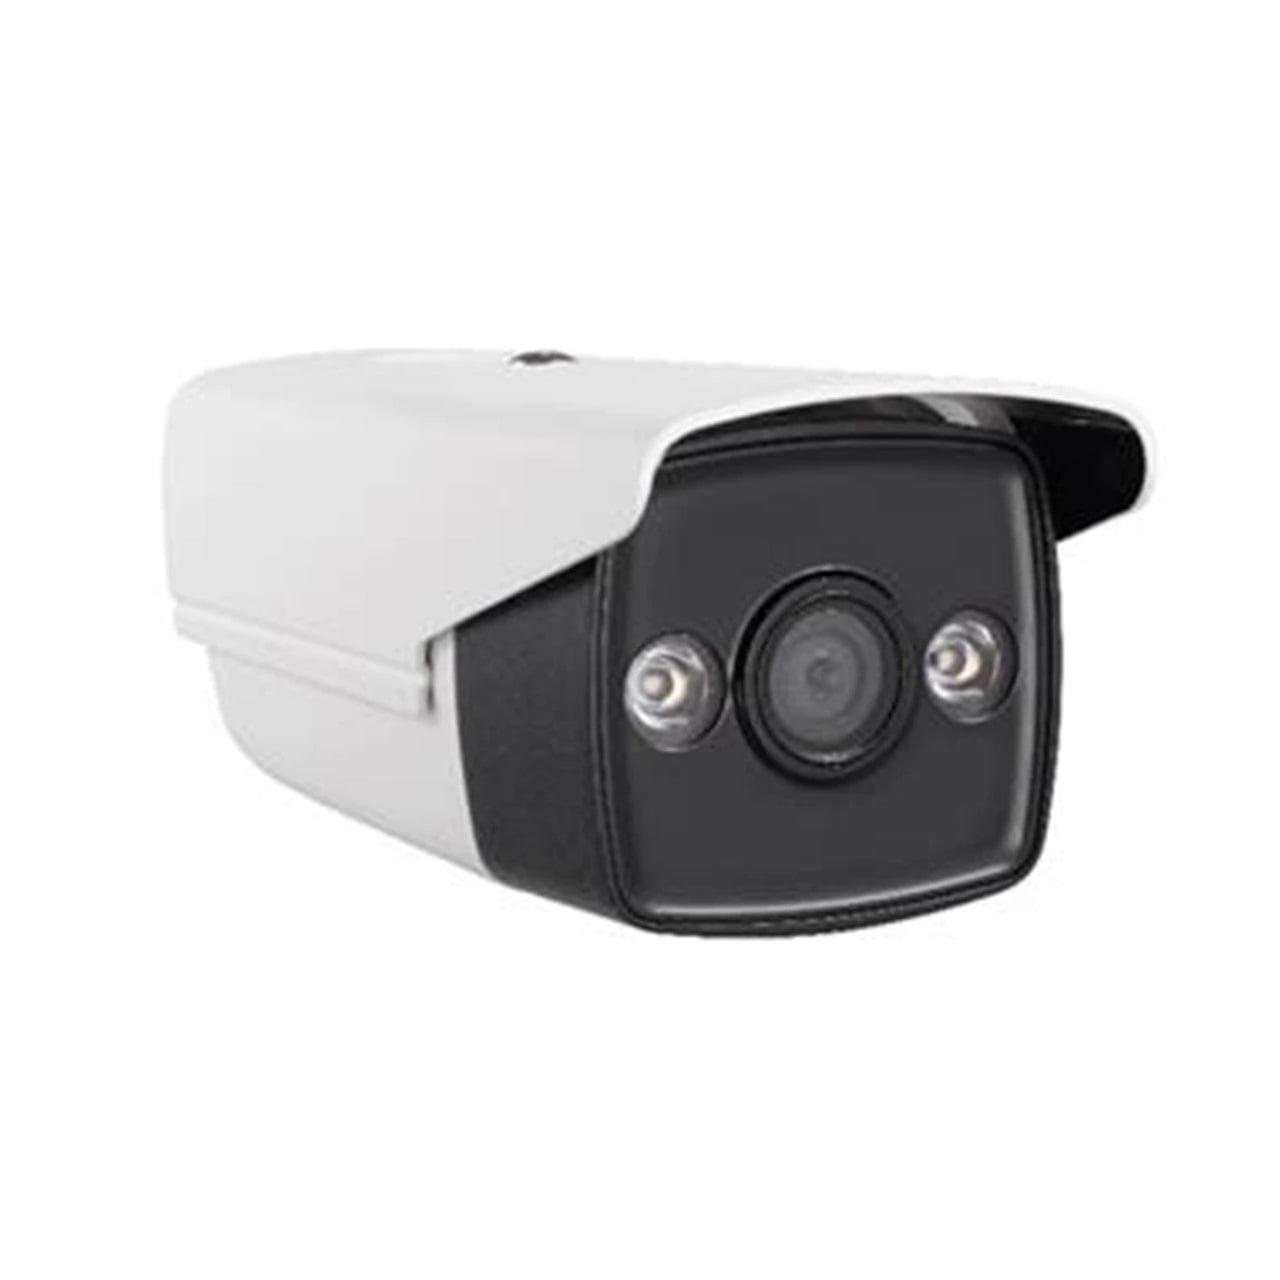 Câmera Hikvision DS-2CE16D0T-WL5 Bullet  Full HD, 1080P, Iluminação por Luz Branca 50Mts, 0,01 Lux/F 1.2, 12V, 2 Megapixel